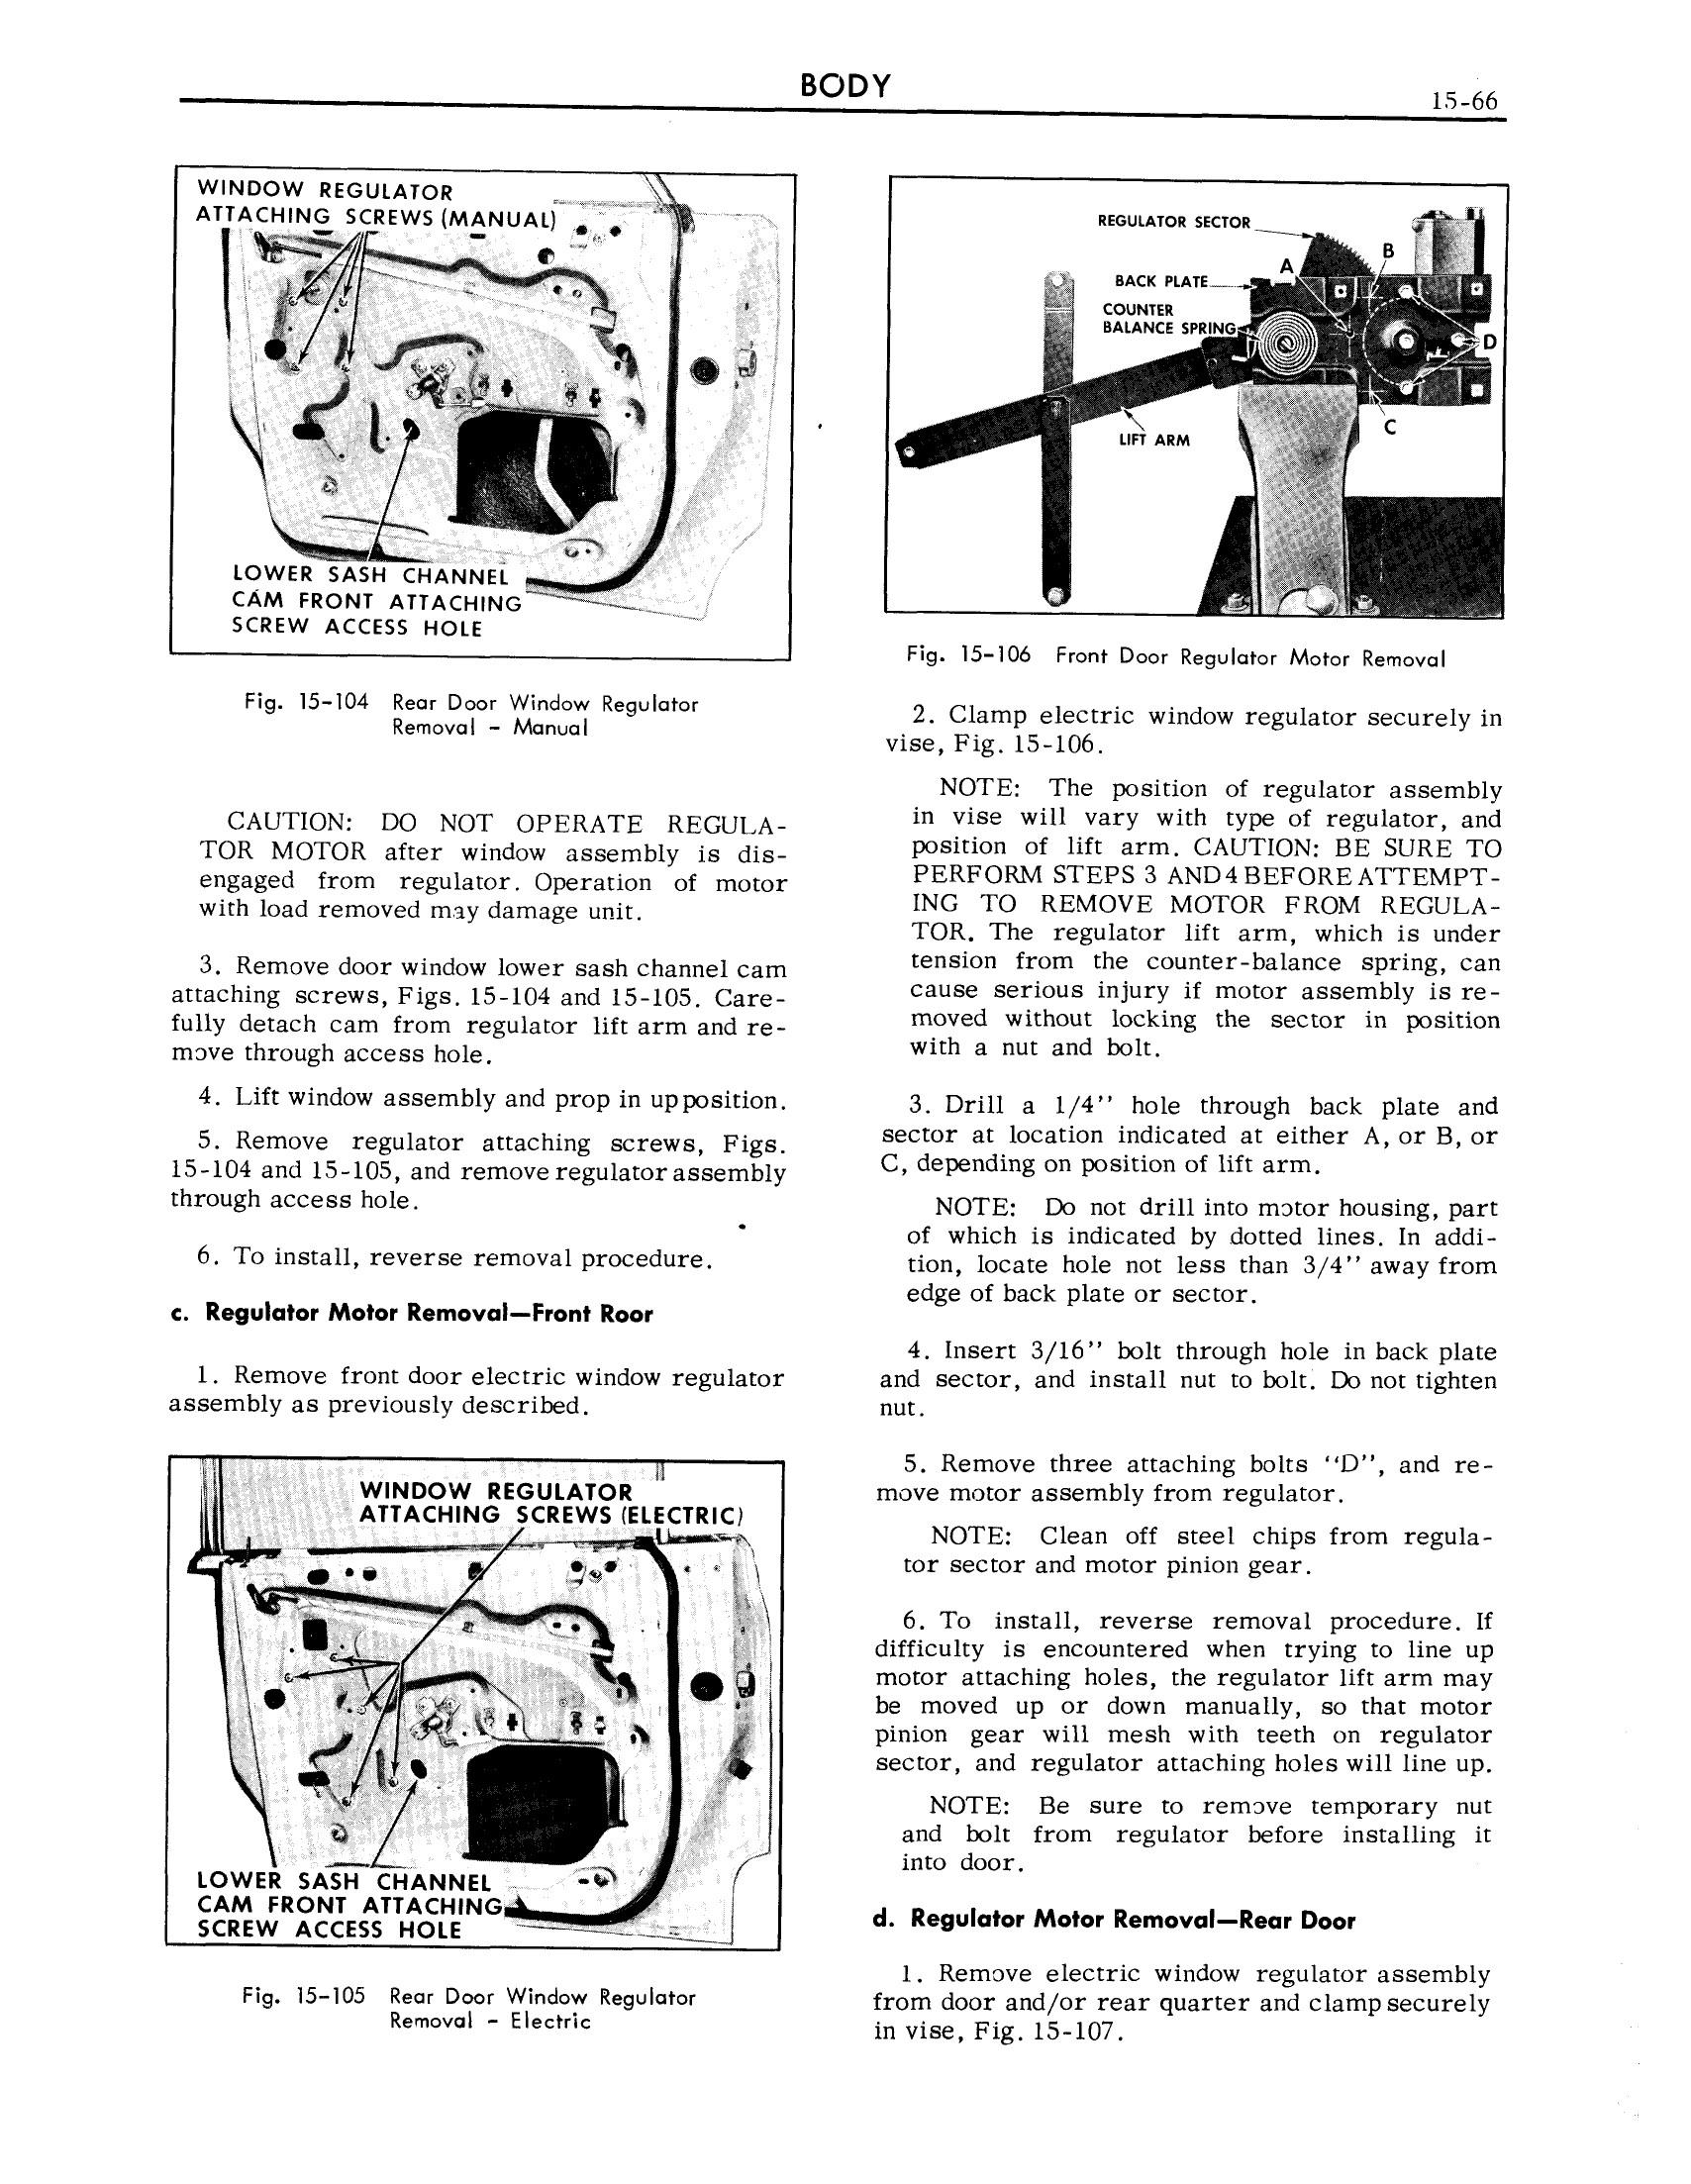 1959 Cadillac Shop Manual- Body Page 66 of 99